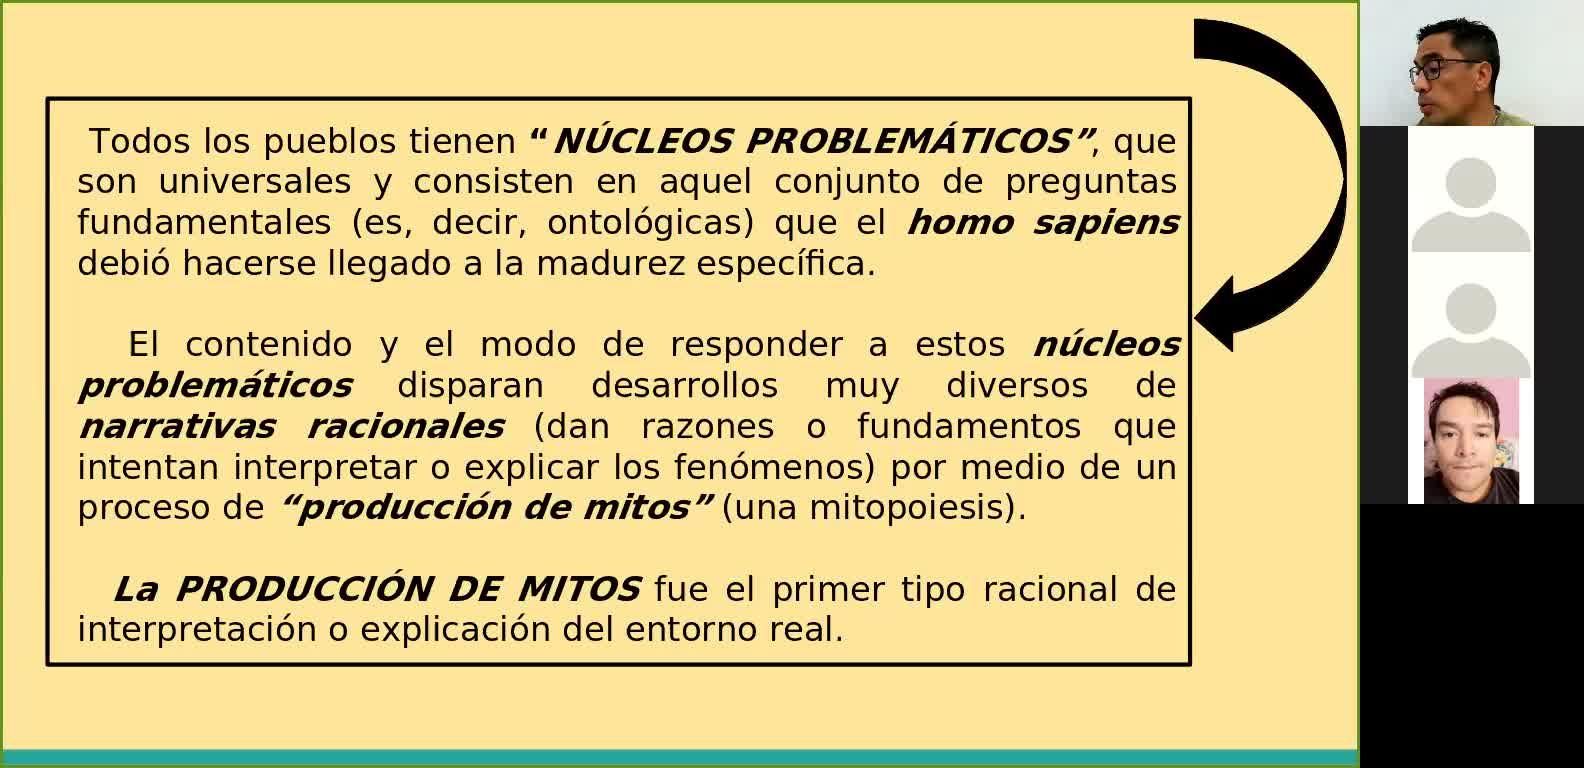 Clase teórica N° 5 05.05.21